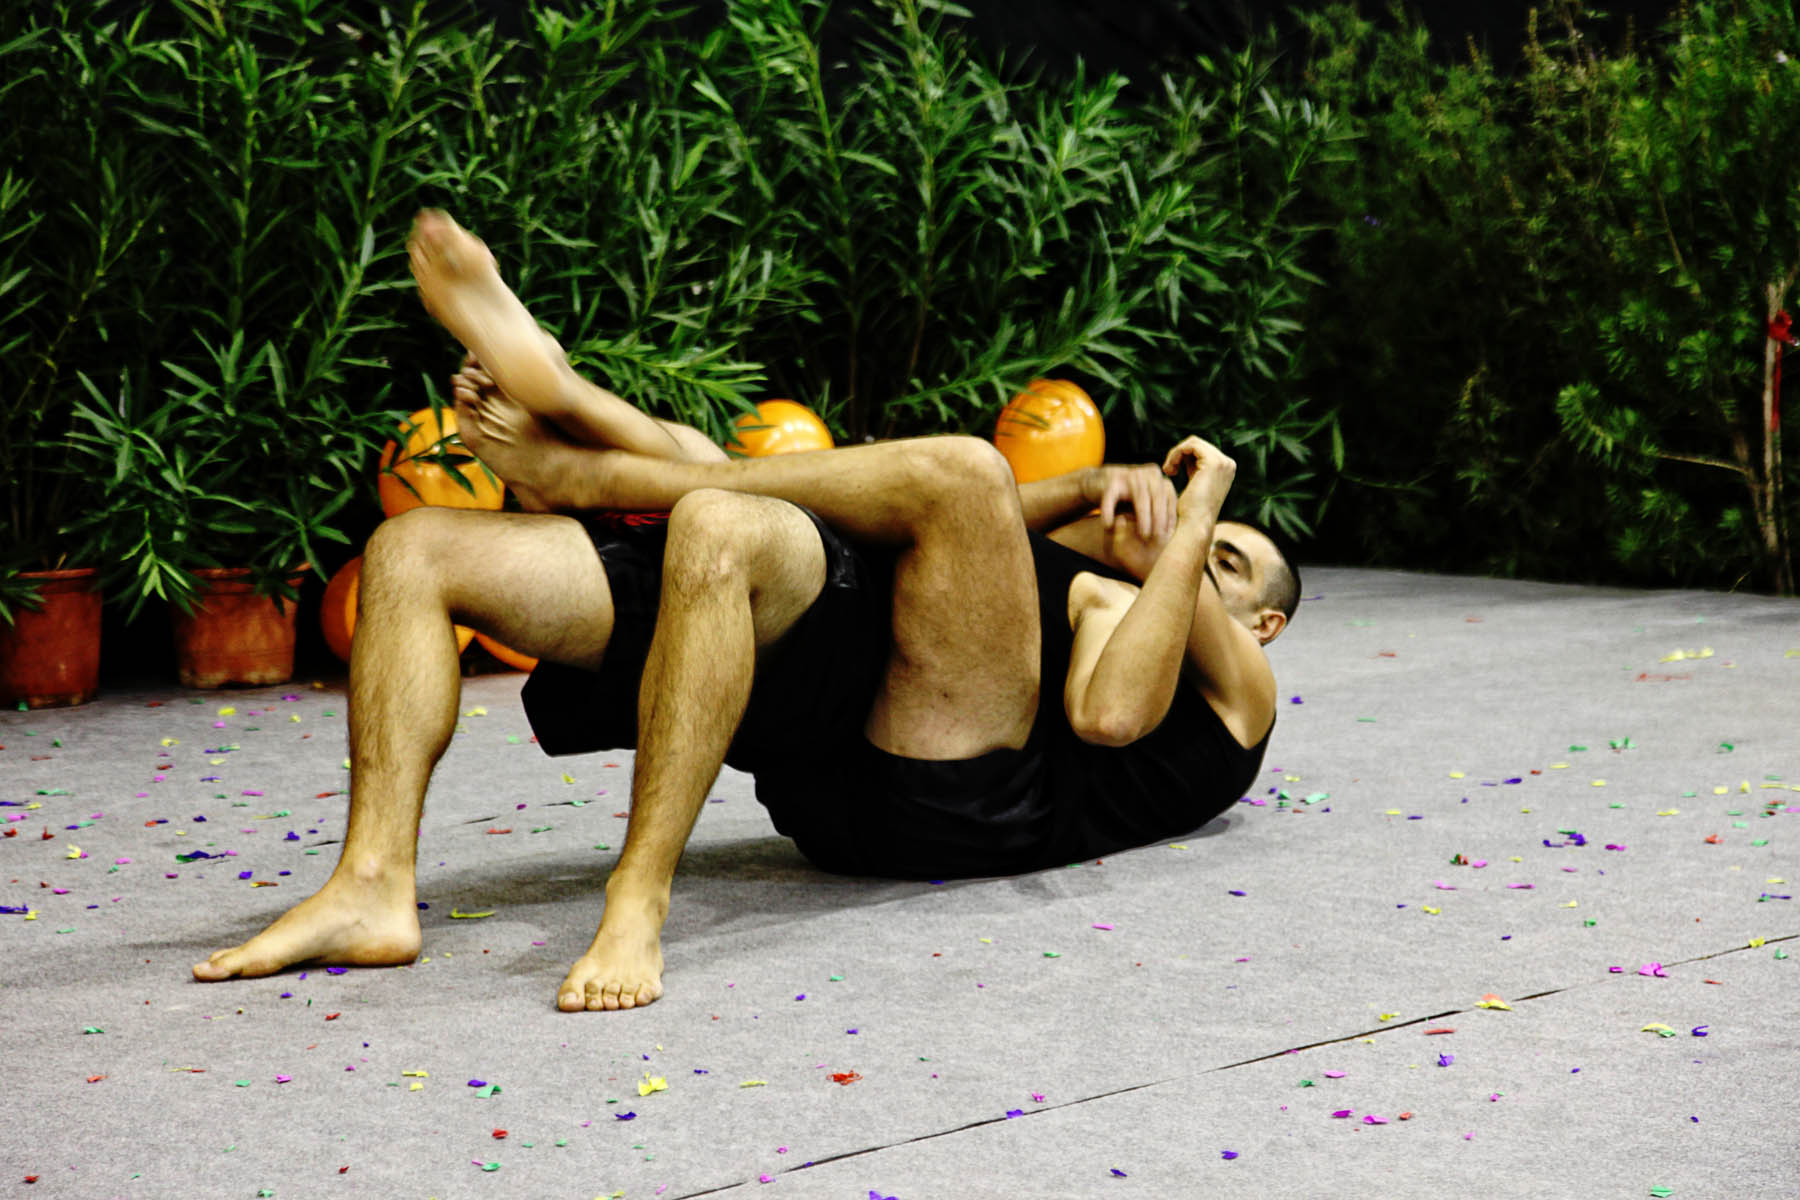 shakti yoga masage martial arts dance thai restaurant albir benidorm altea lanucia calpe alfas 10